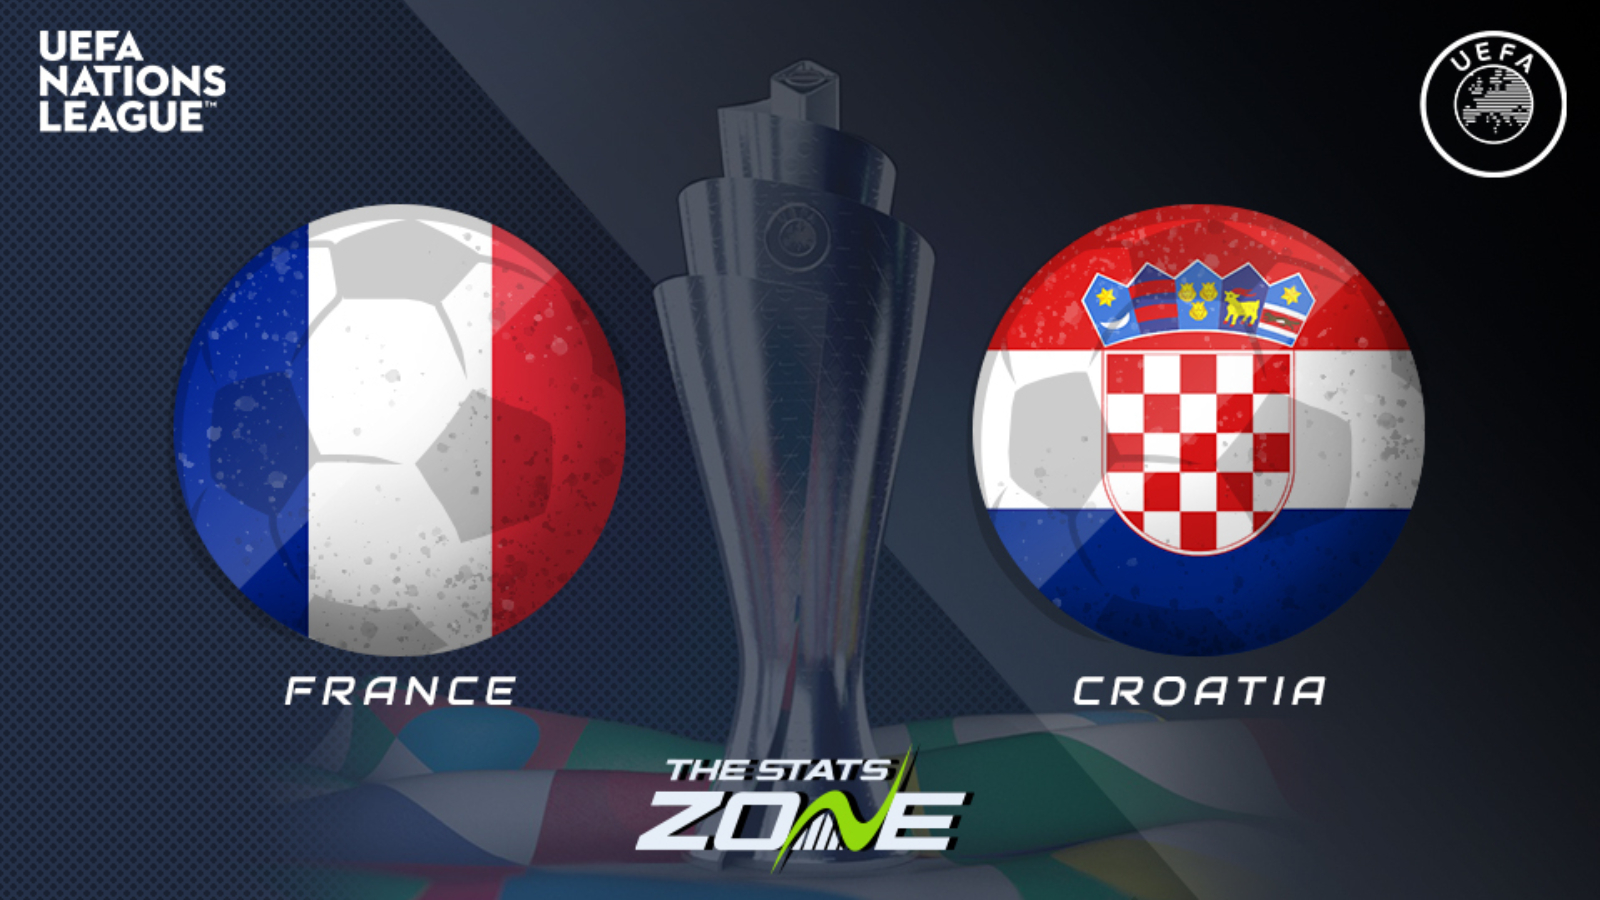 Italy v croatia betting previews fantasy sports betting software provider